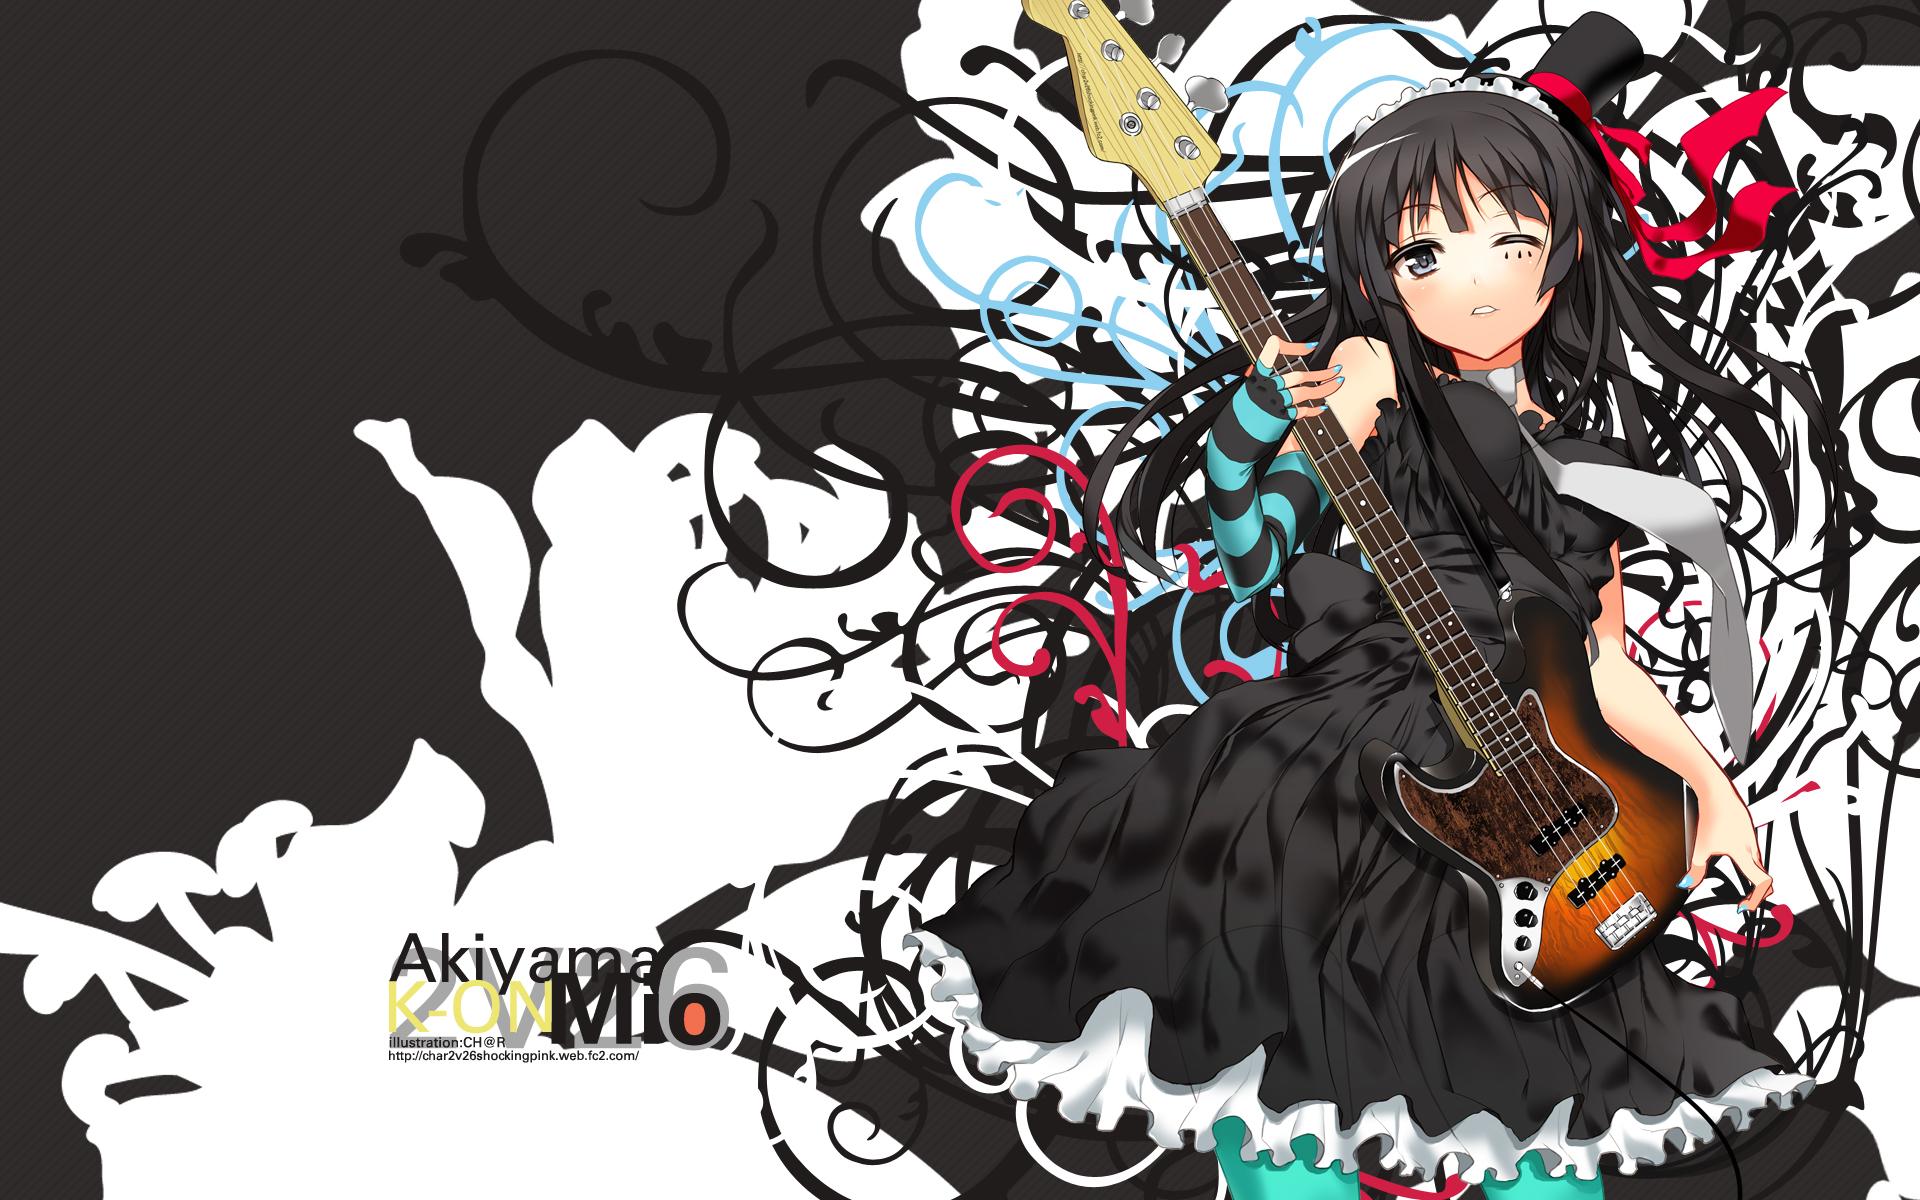 akiyama_mio black_eyes black_hair ch@r dress gloves guitar instrument k-on! long_hair tie